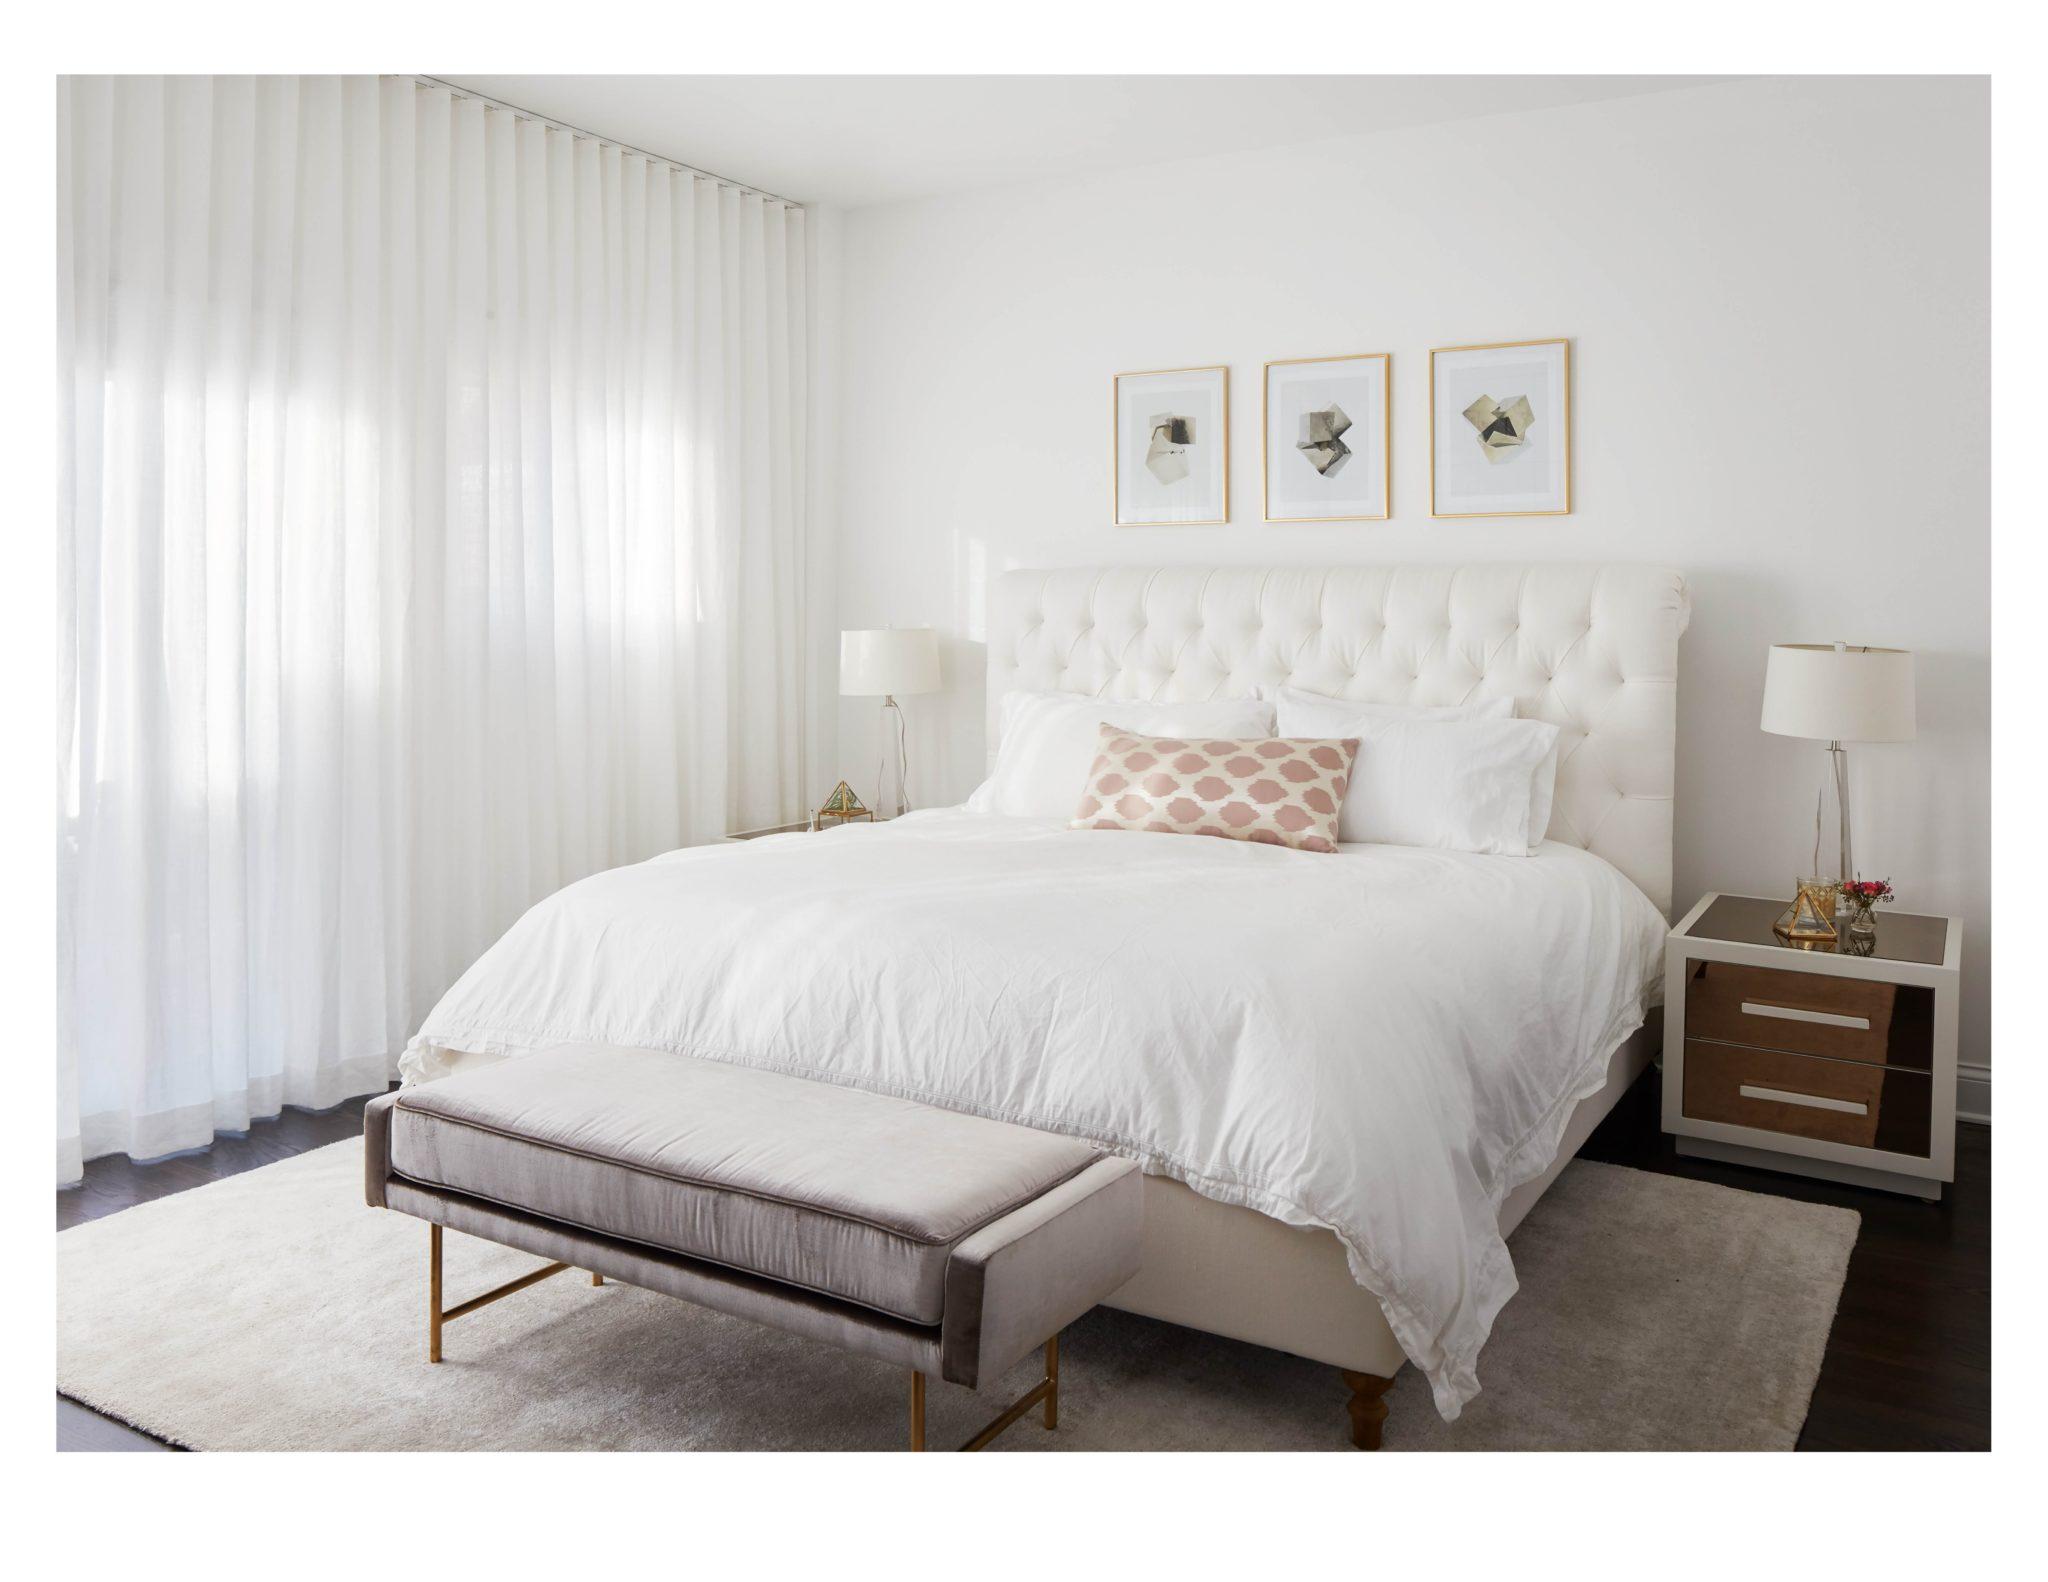 Lincoln Park master bedroom by Jen Talbot Design